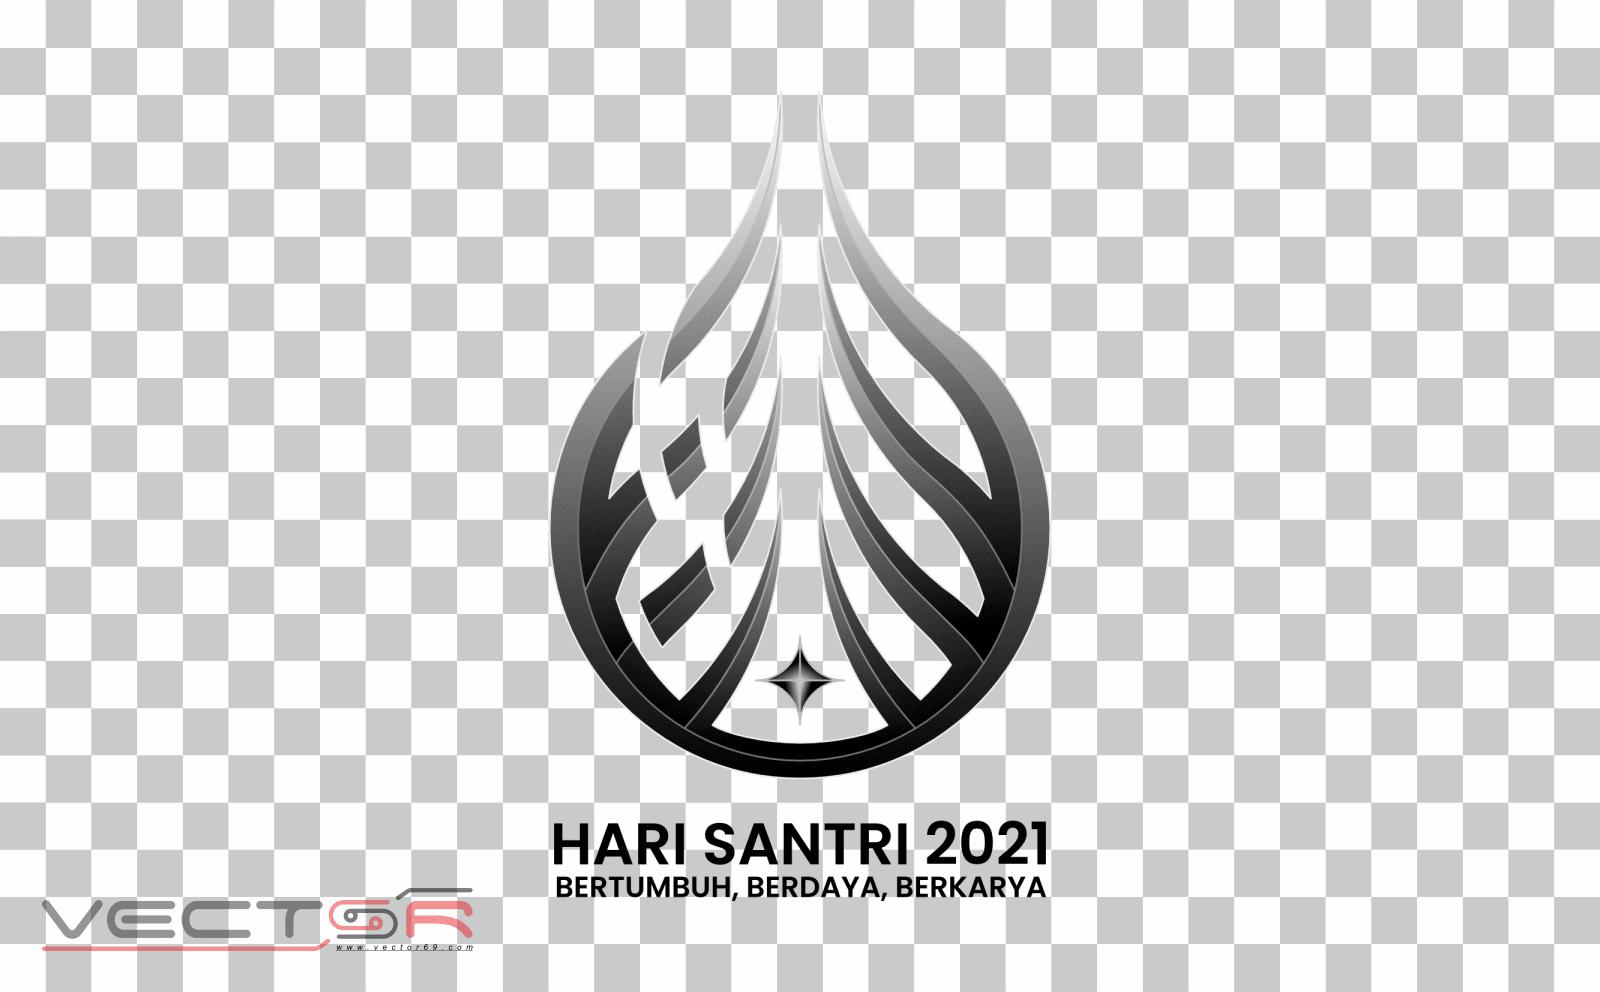 Hari Santri 2021 RMI-NU Grayscale Logo - Download .PNG (Portable Network Graphics) Transparent Images